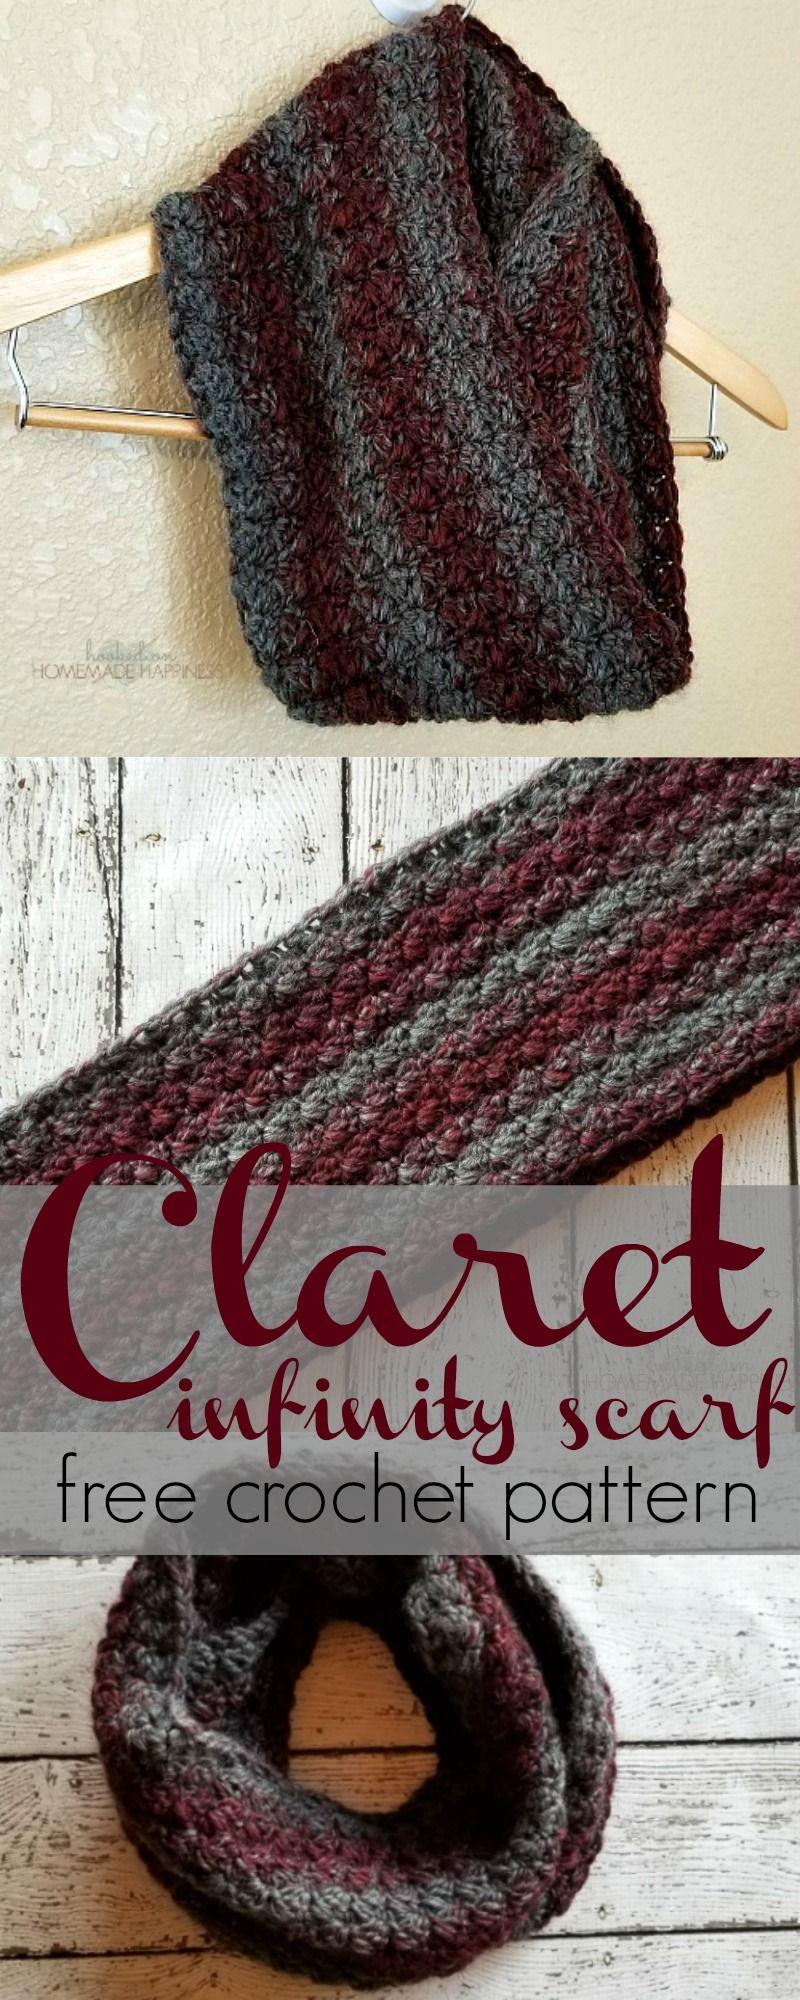 Claret Infinity Crochet Scarf Pattern | Pinterest | Basic crochet ...